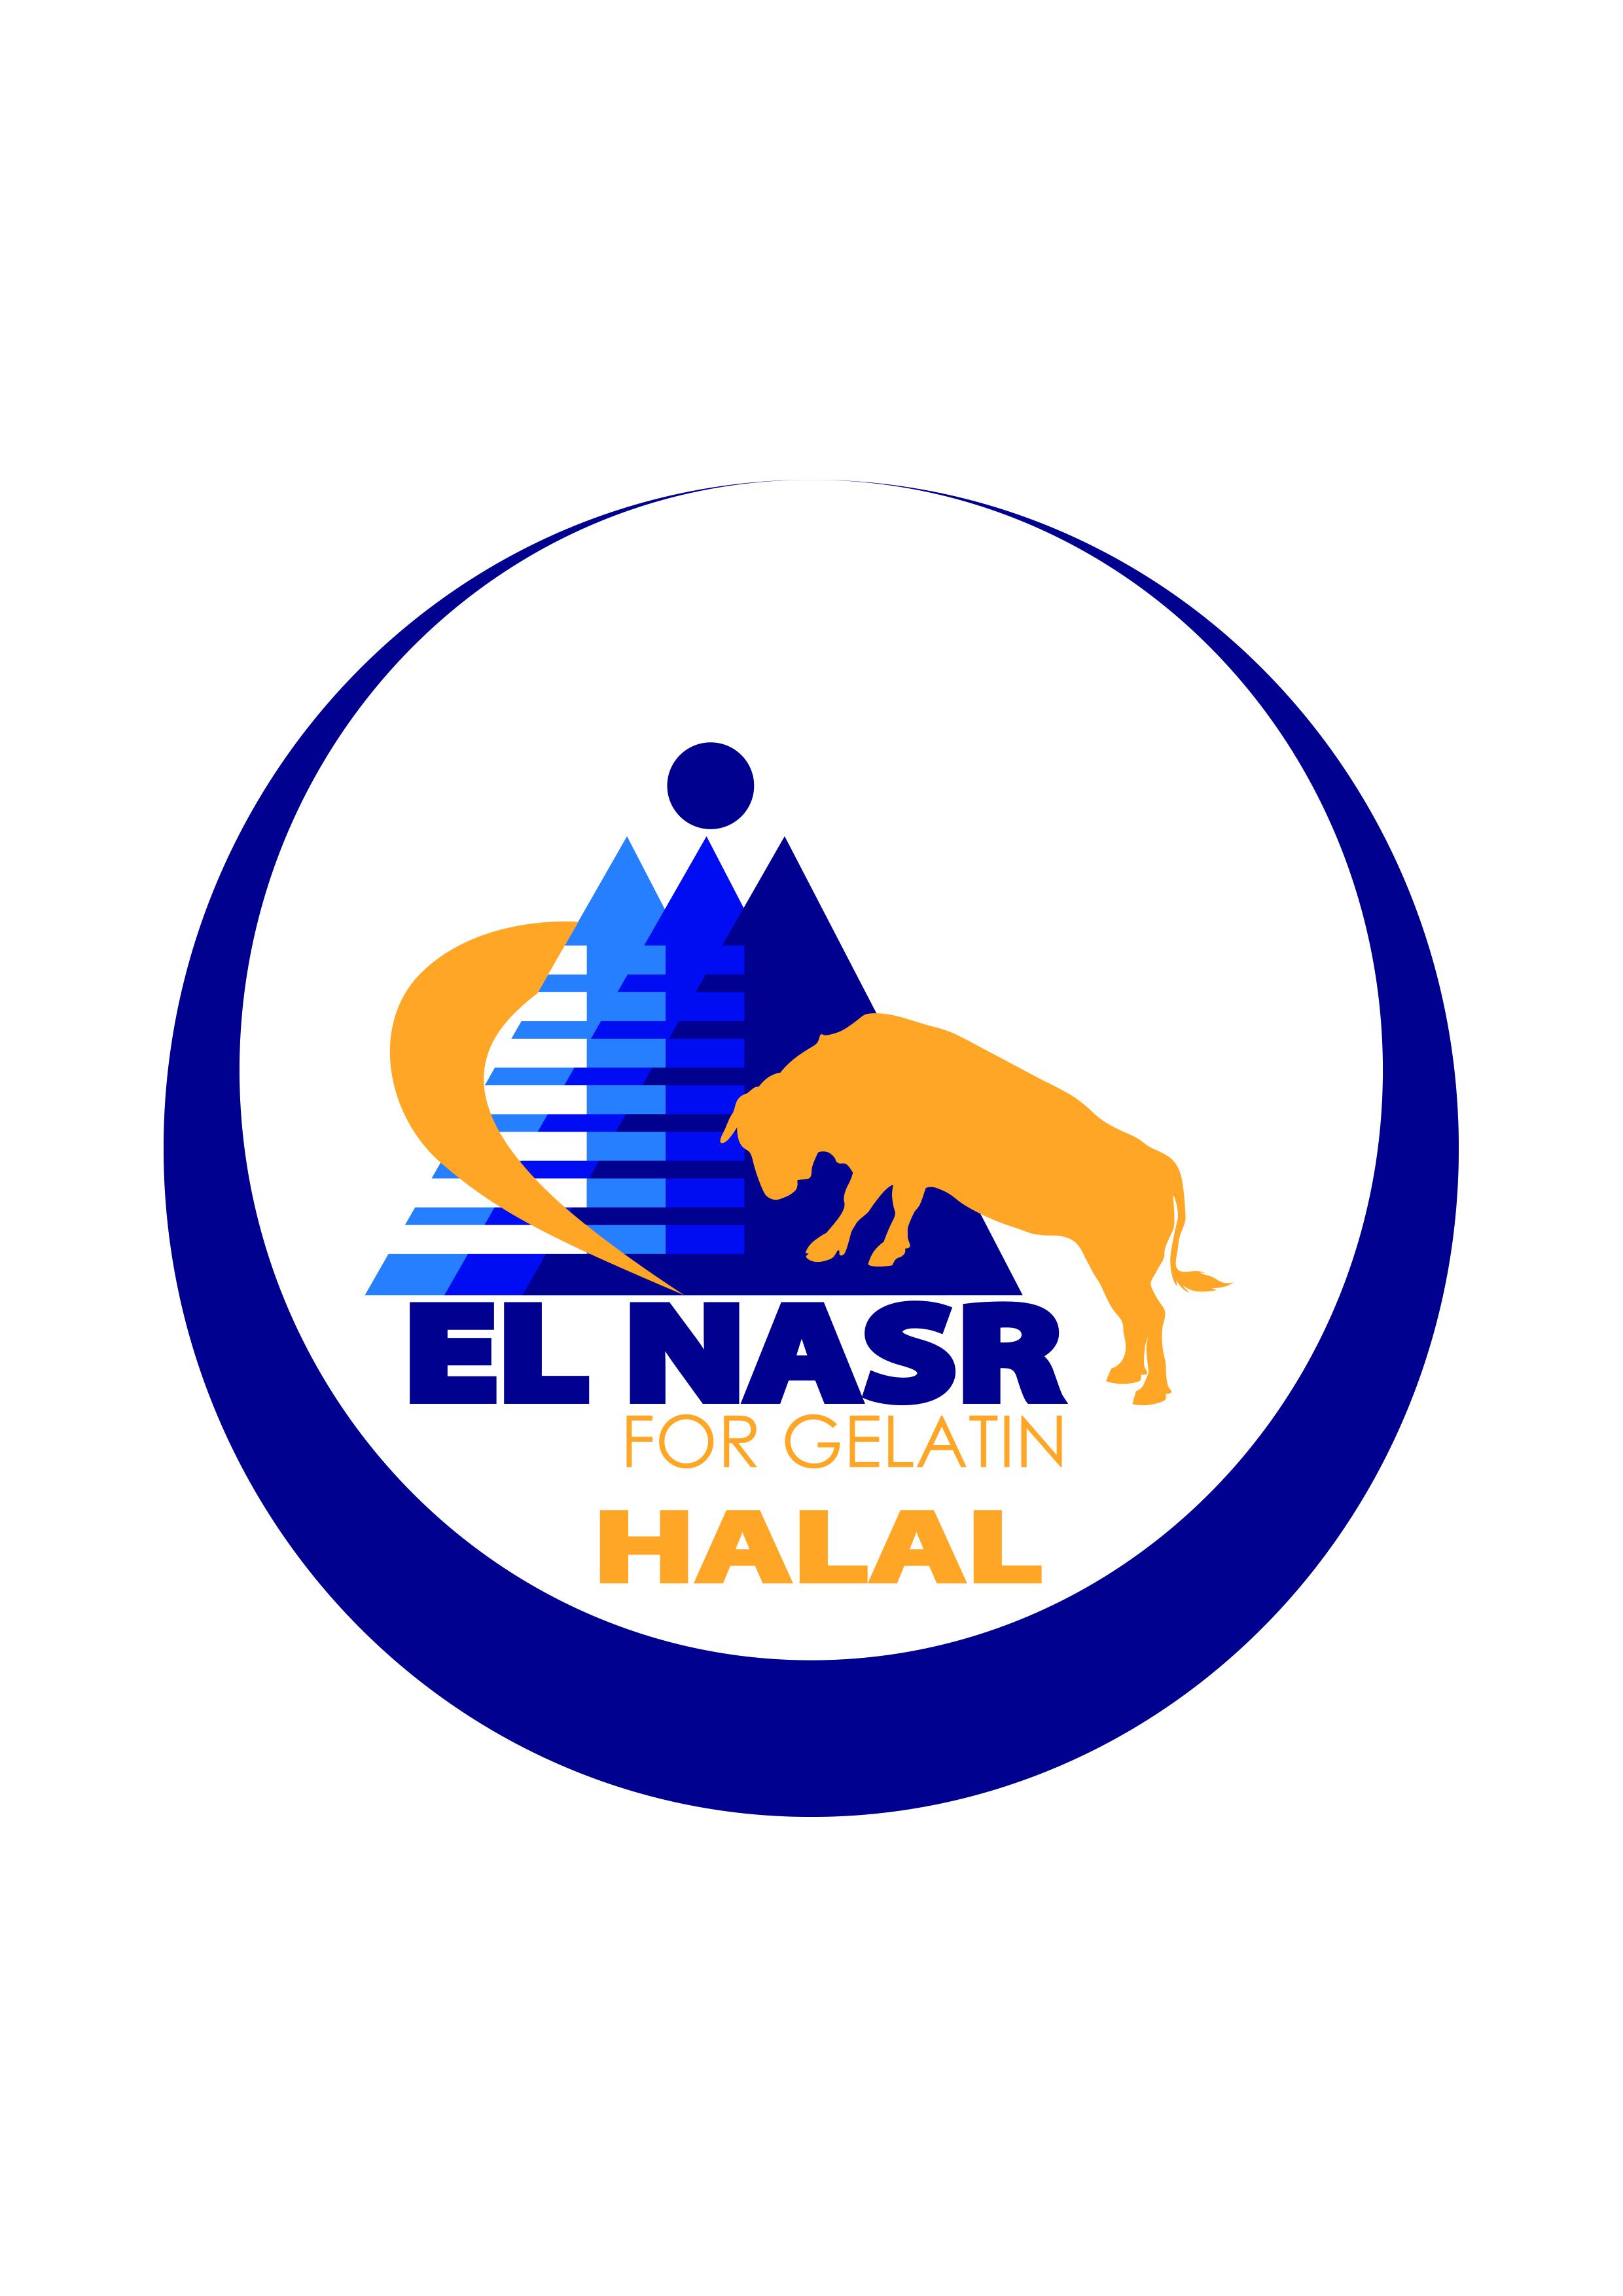 El Nasr For Gelatin Co